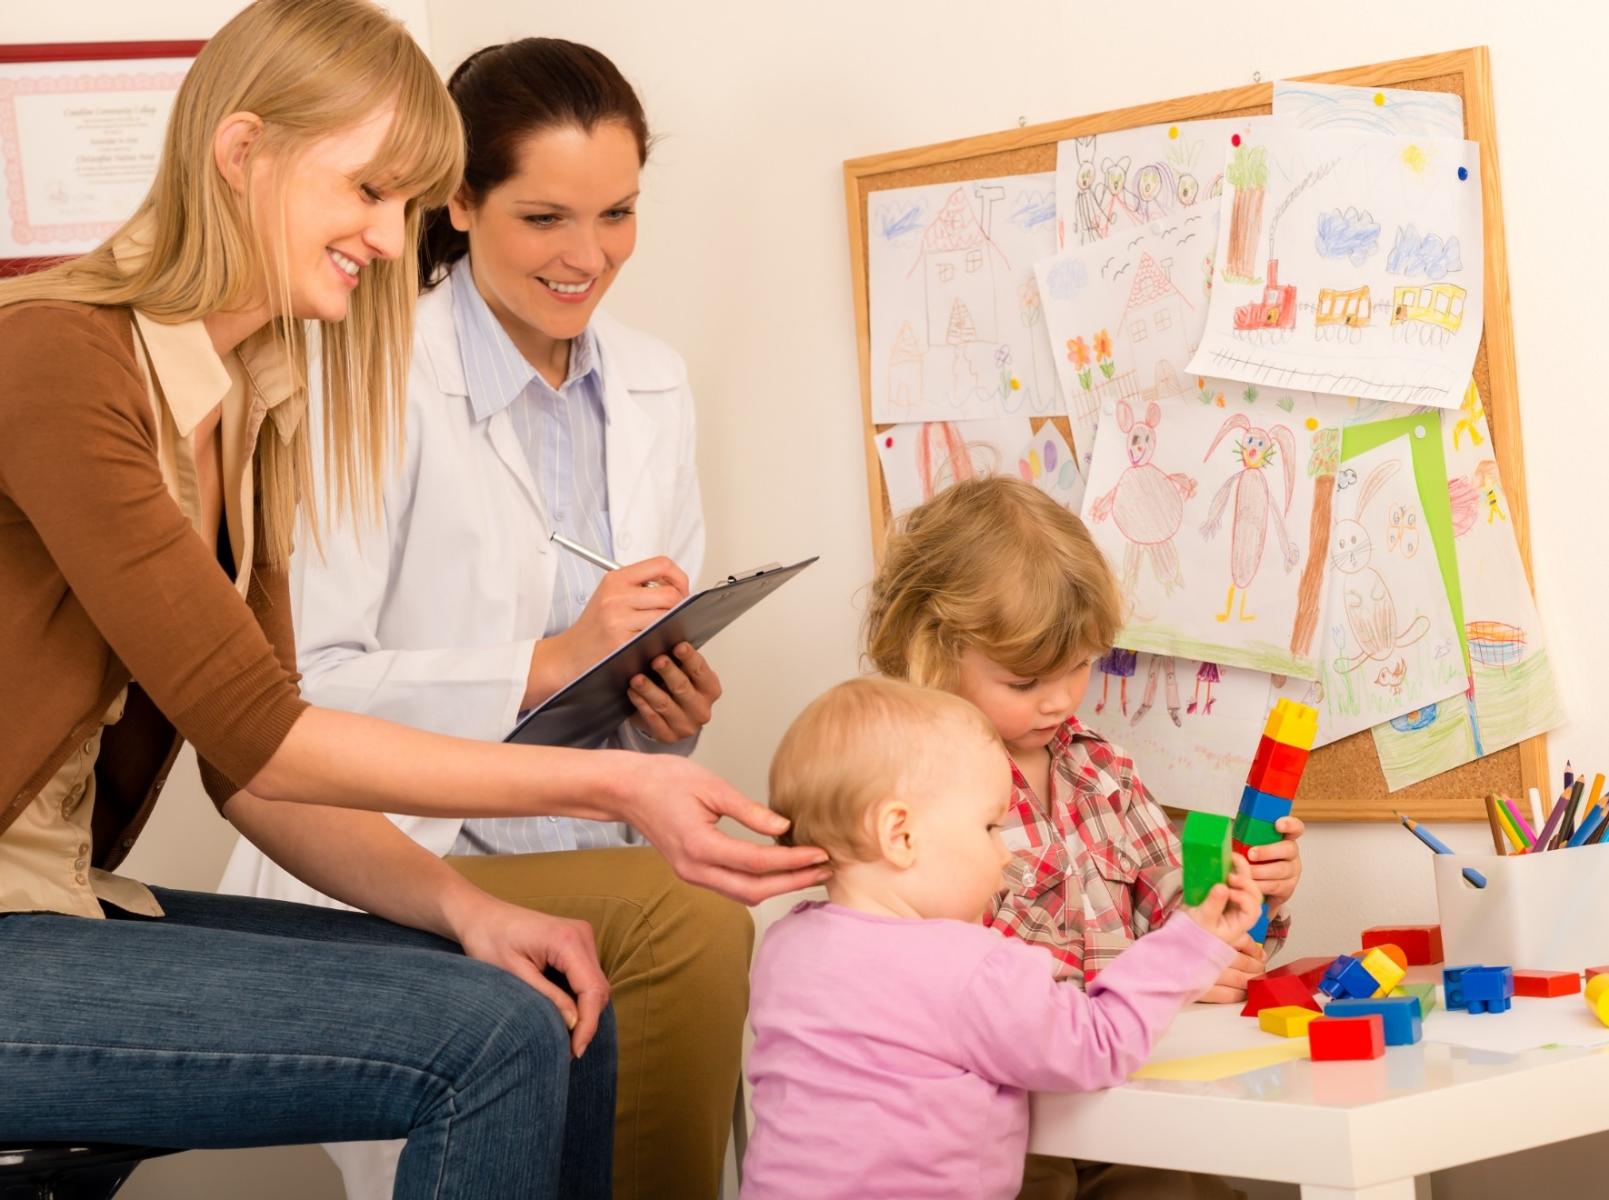 Pediatric Pulmonology Photo